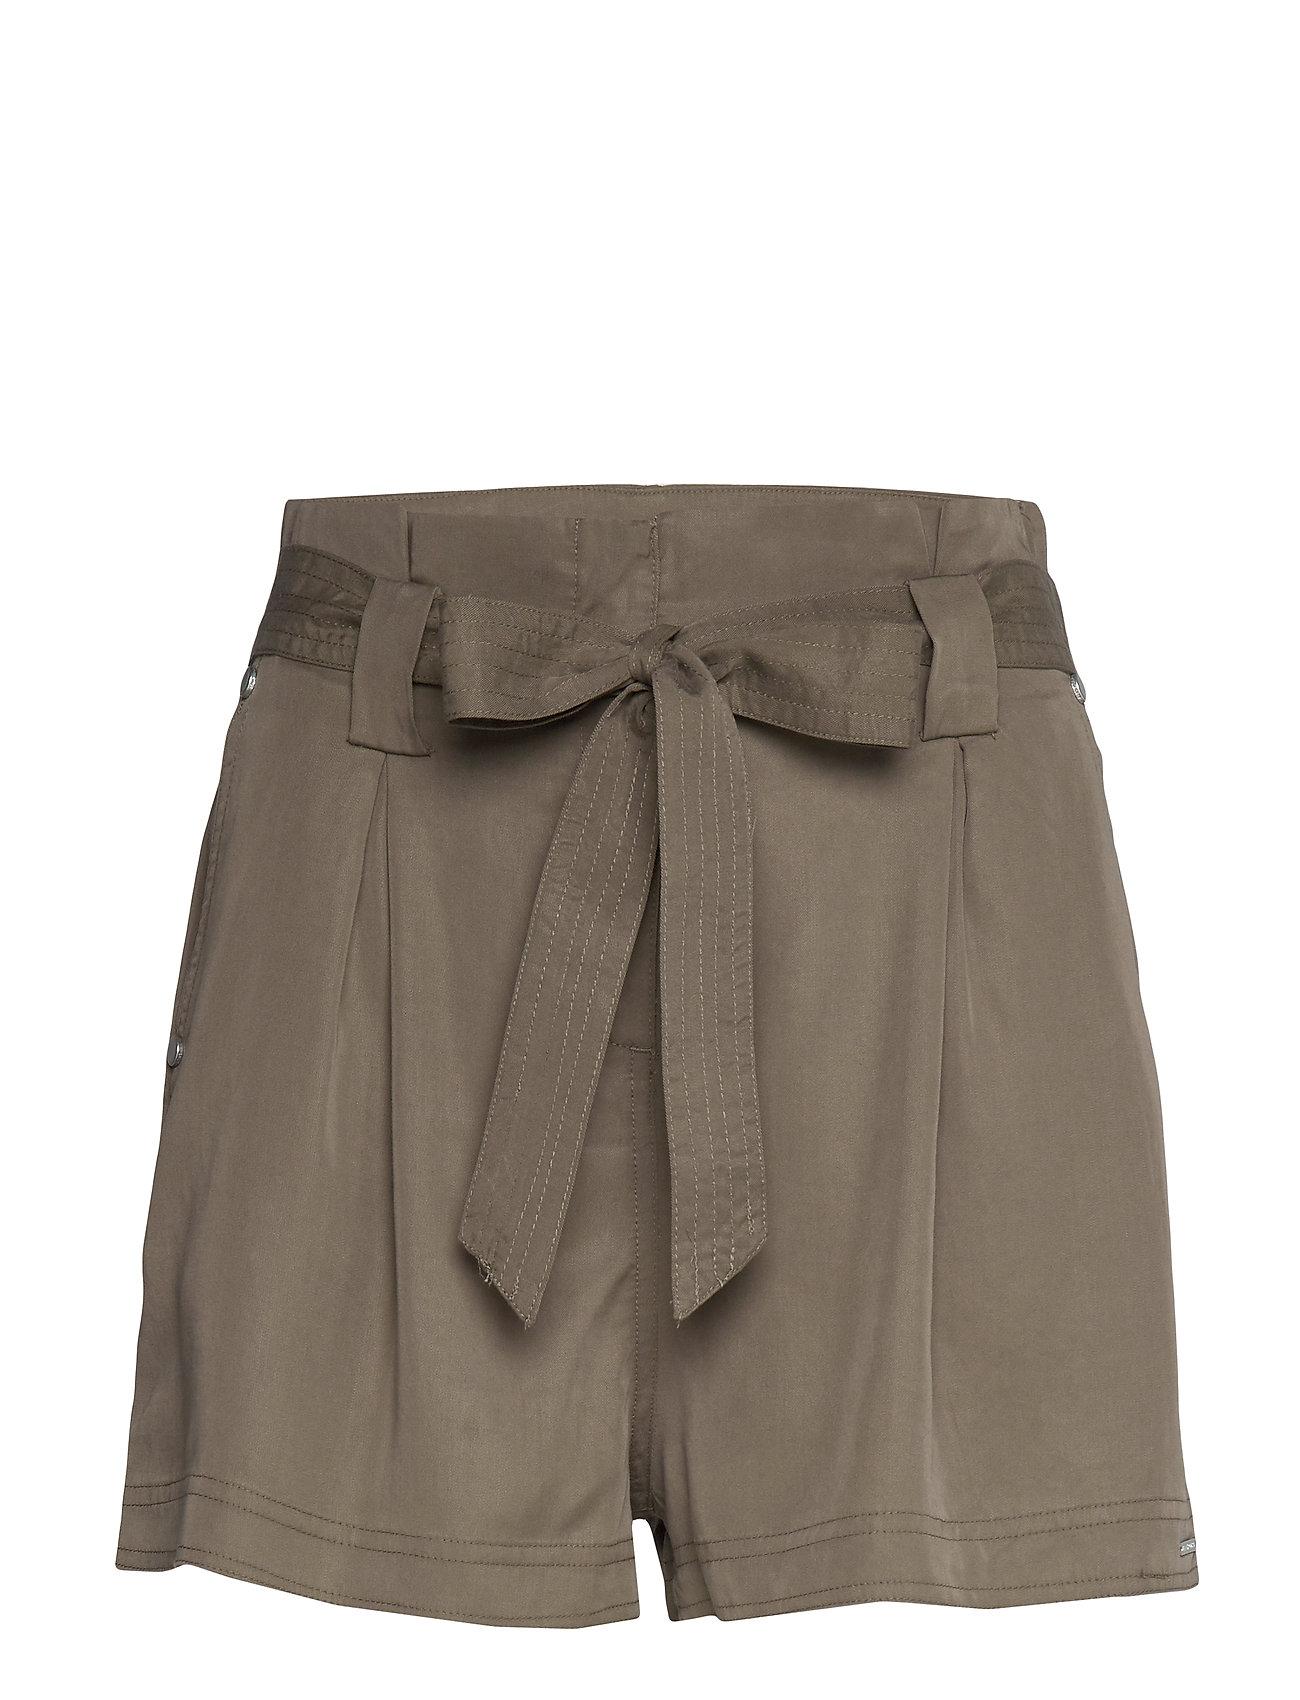 Image of Desert Paper Bag Short Shorts Flowy Shorts/Casual Shorts Brun Superdry (3351891069)